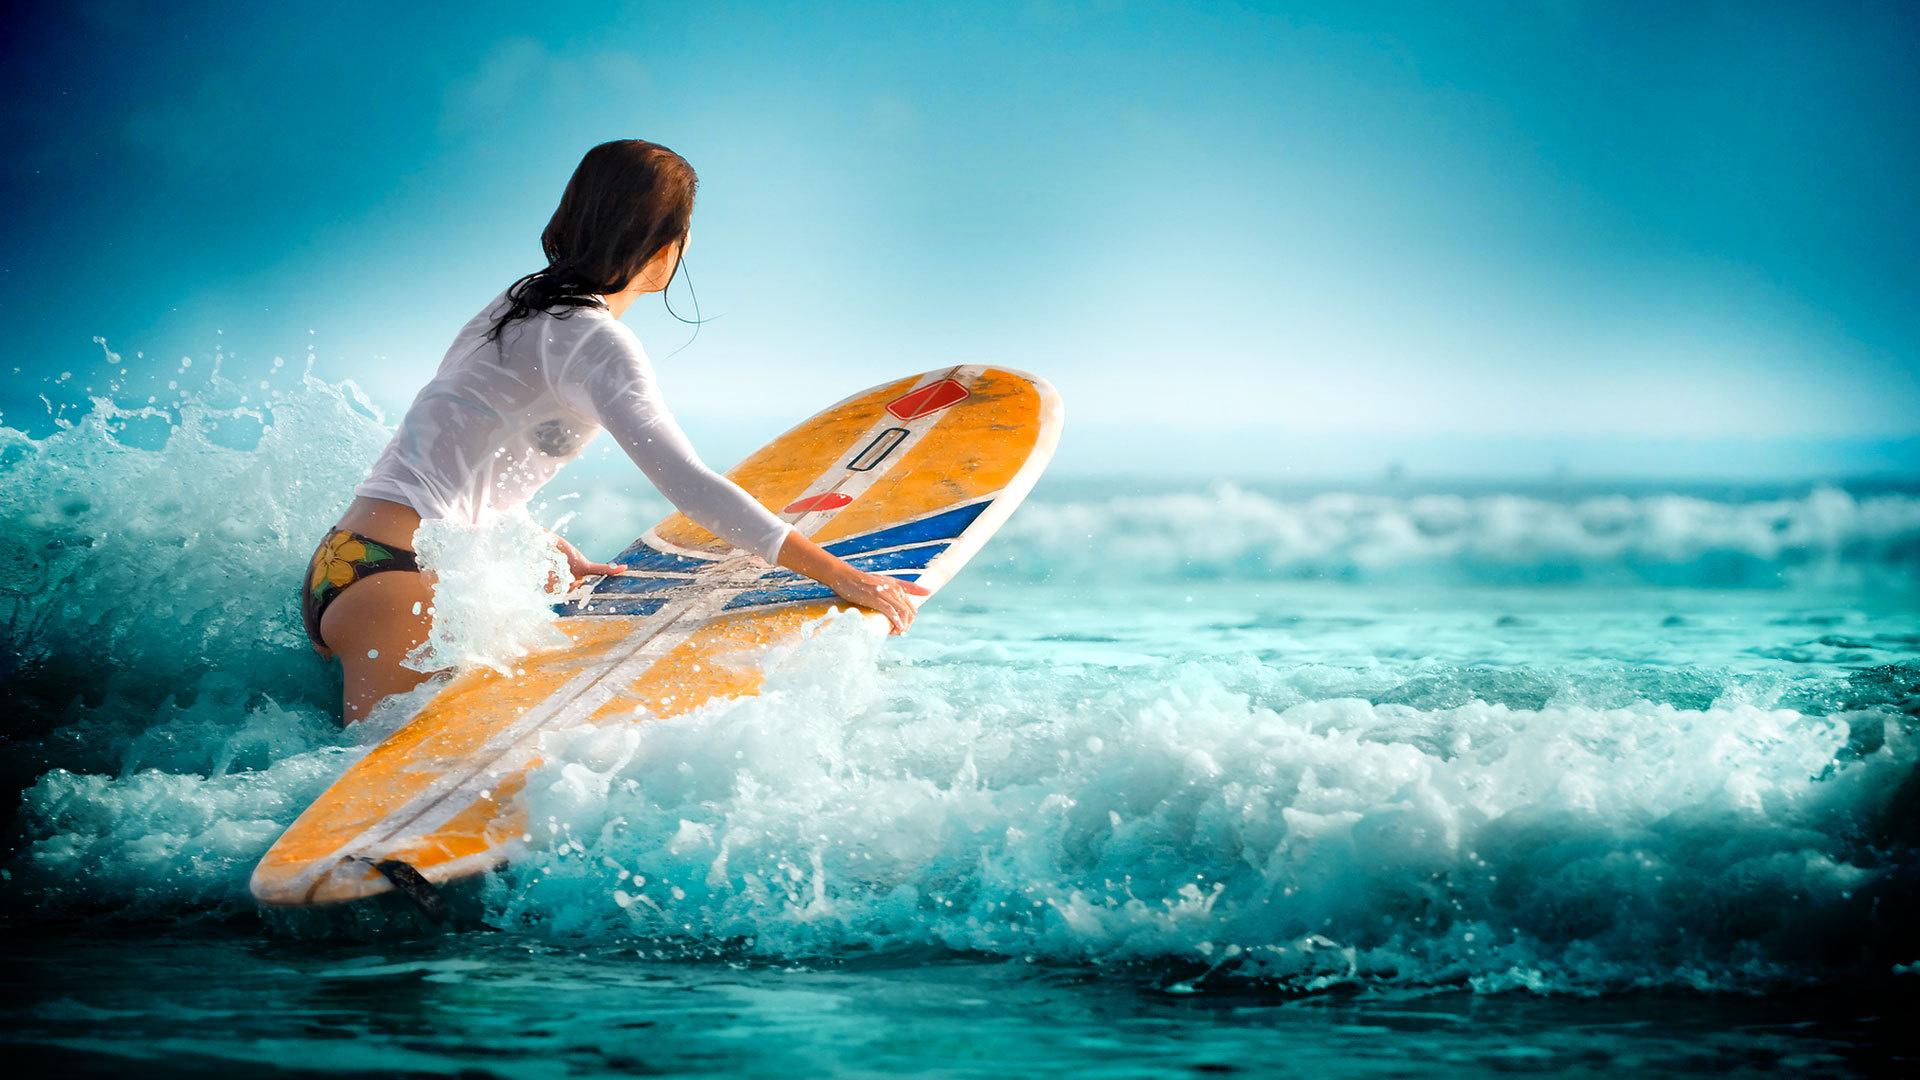 Sport-Girl-Surfing-Waves-Wallpaper (2)